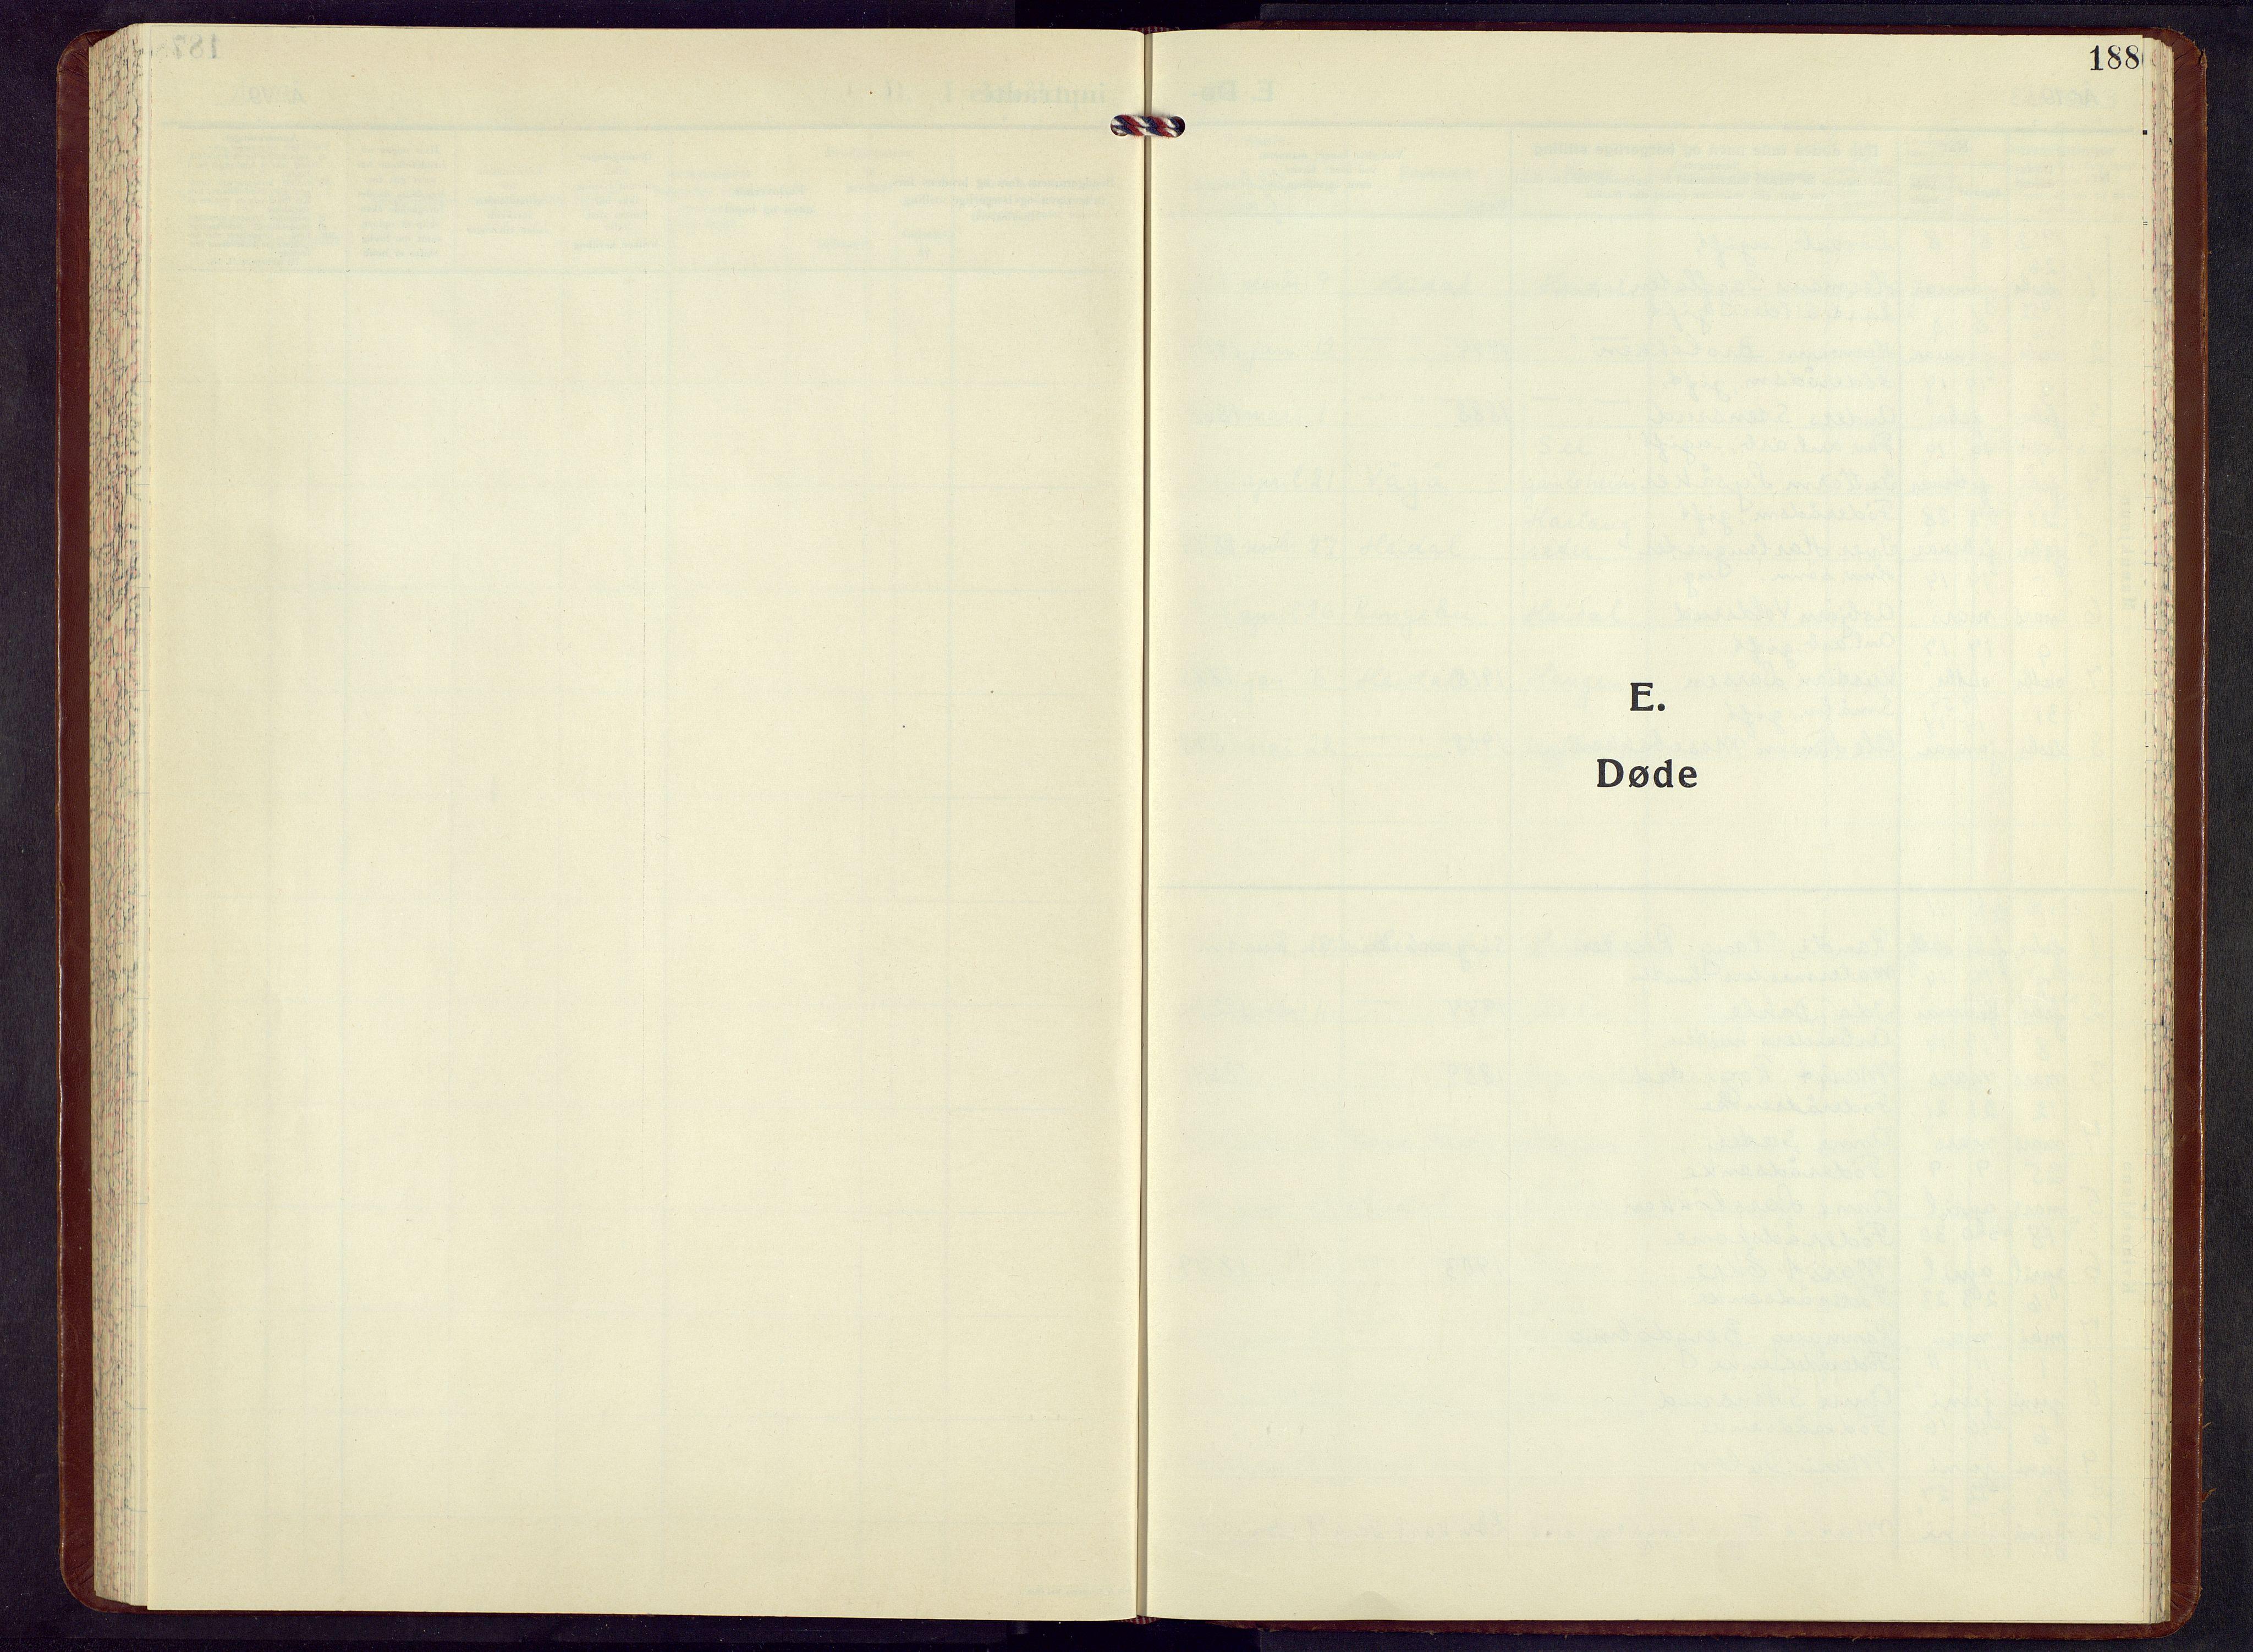 SAH, Sel prestekontor, Klokkerbok nr. 7, 1953-1973, s. 188